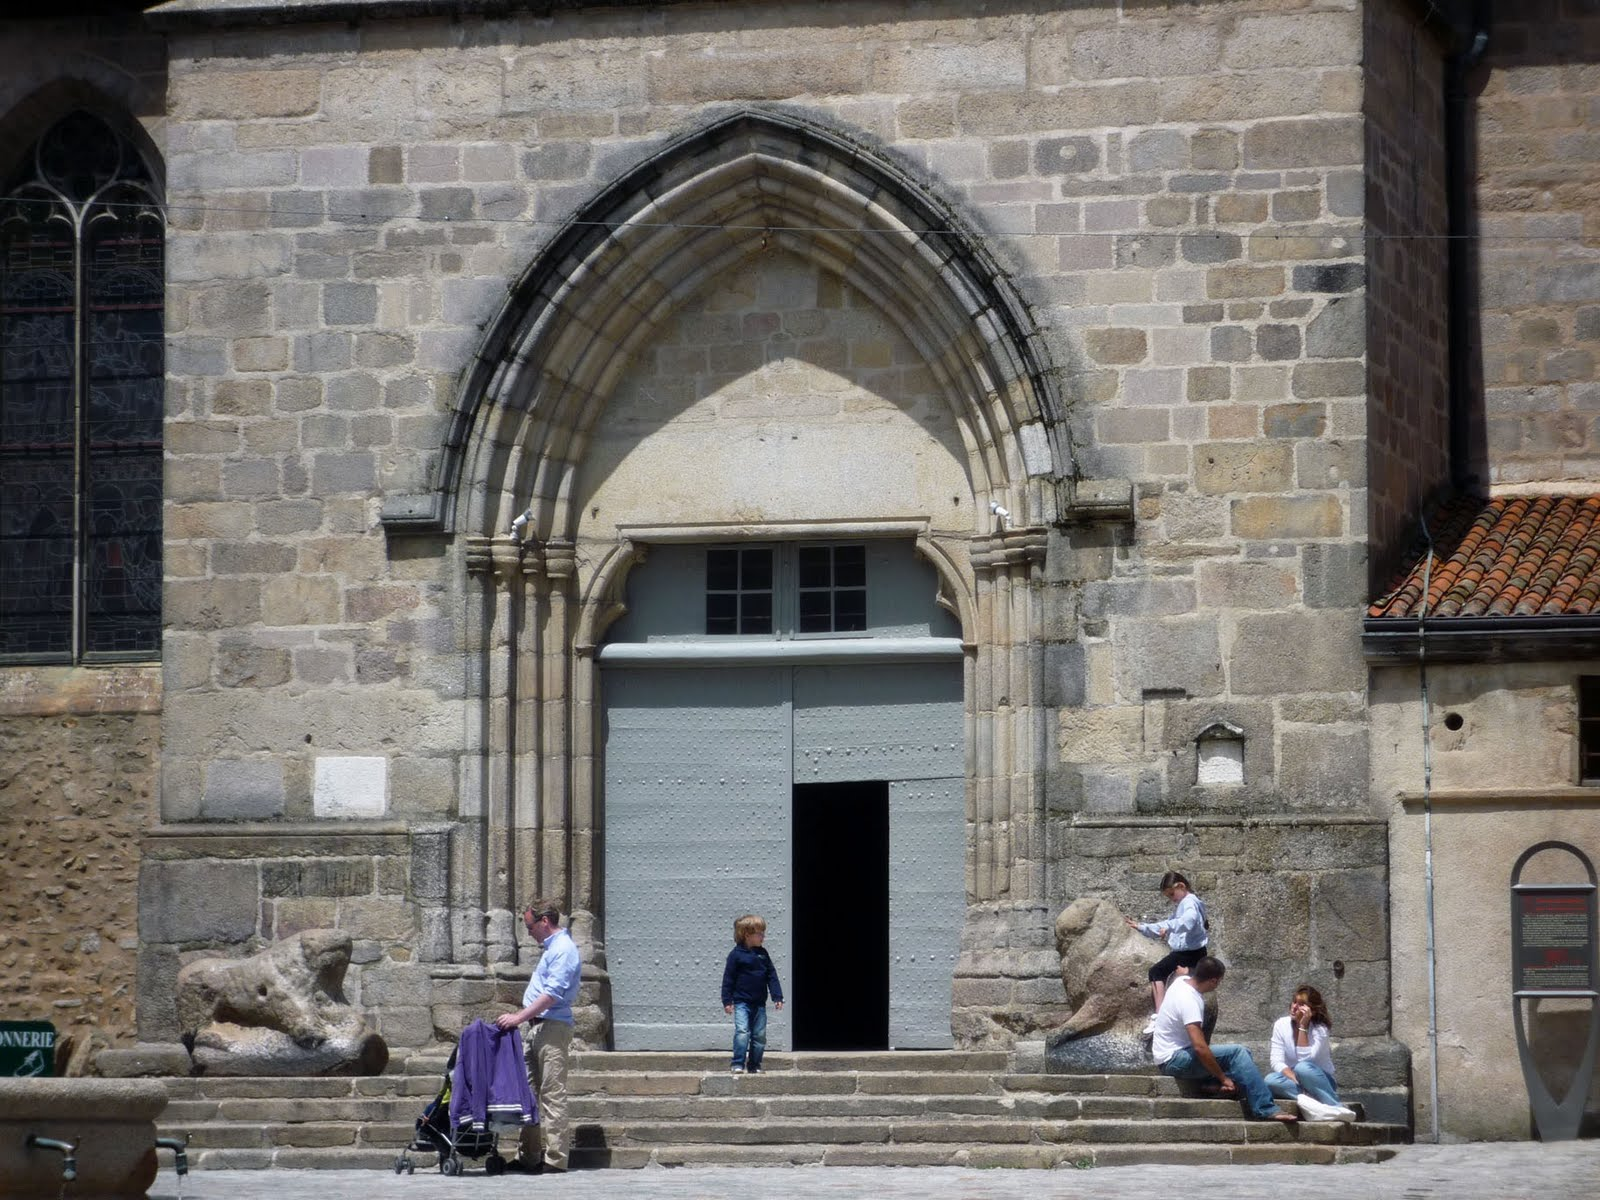 The church of St. Michel des Lions